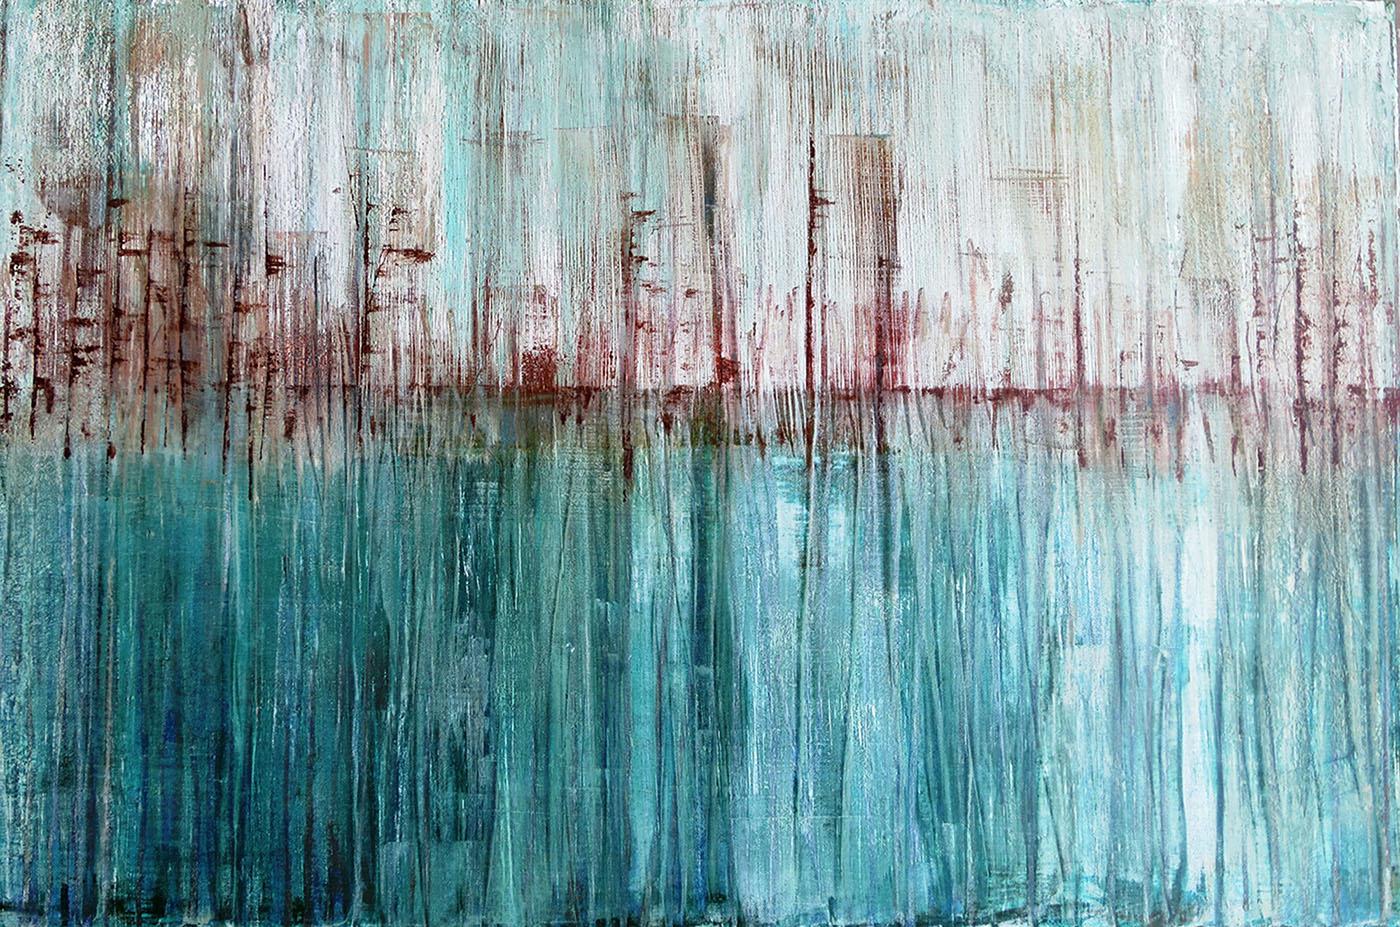 Free Download Art Abstract Painting Wallpaper Desktop 13777